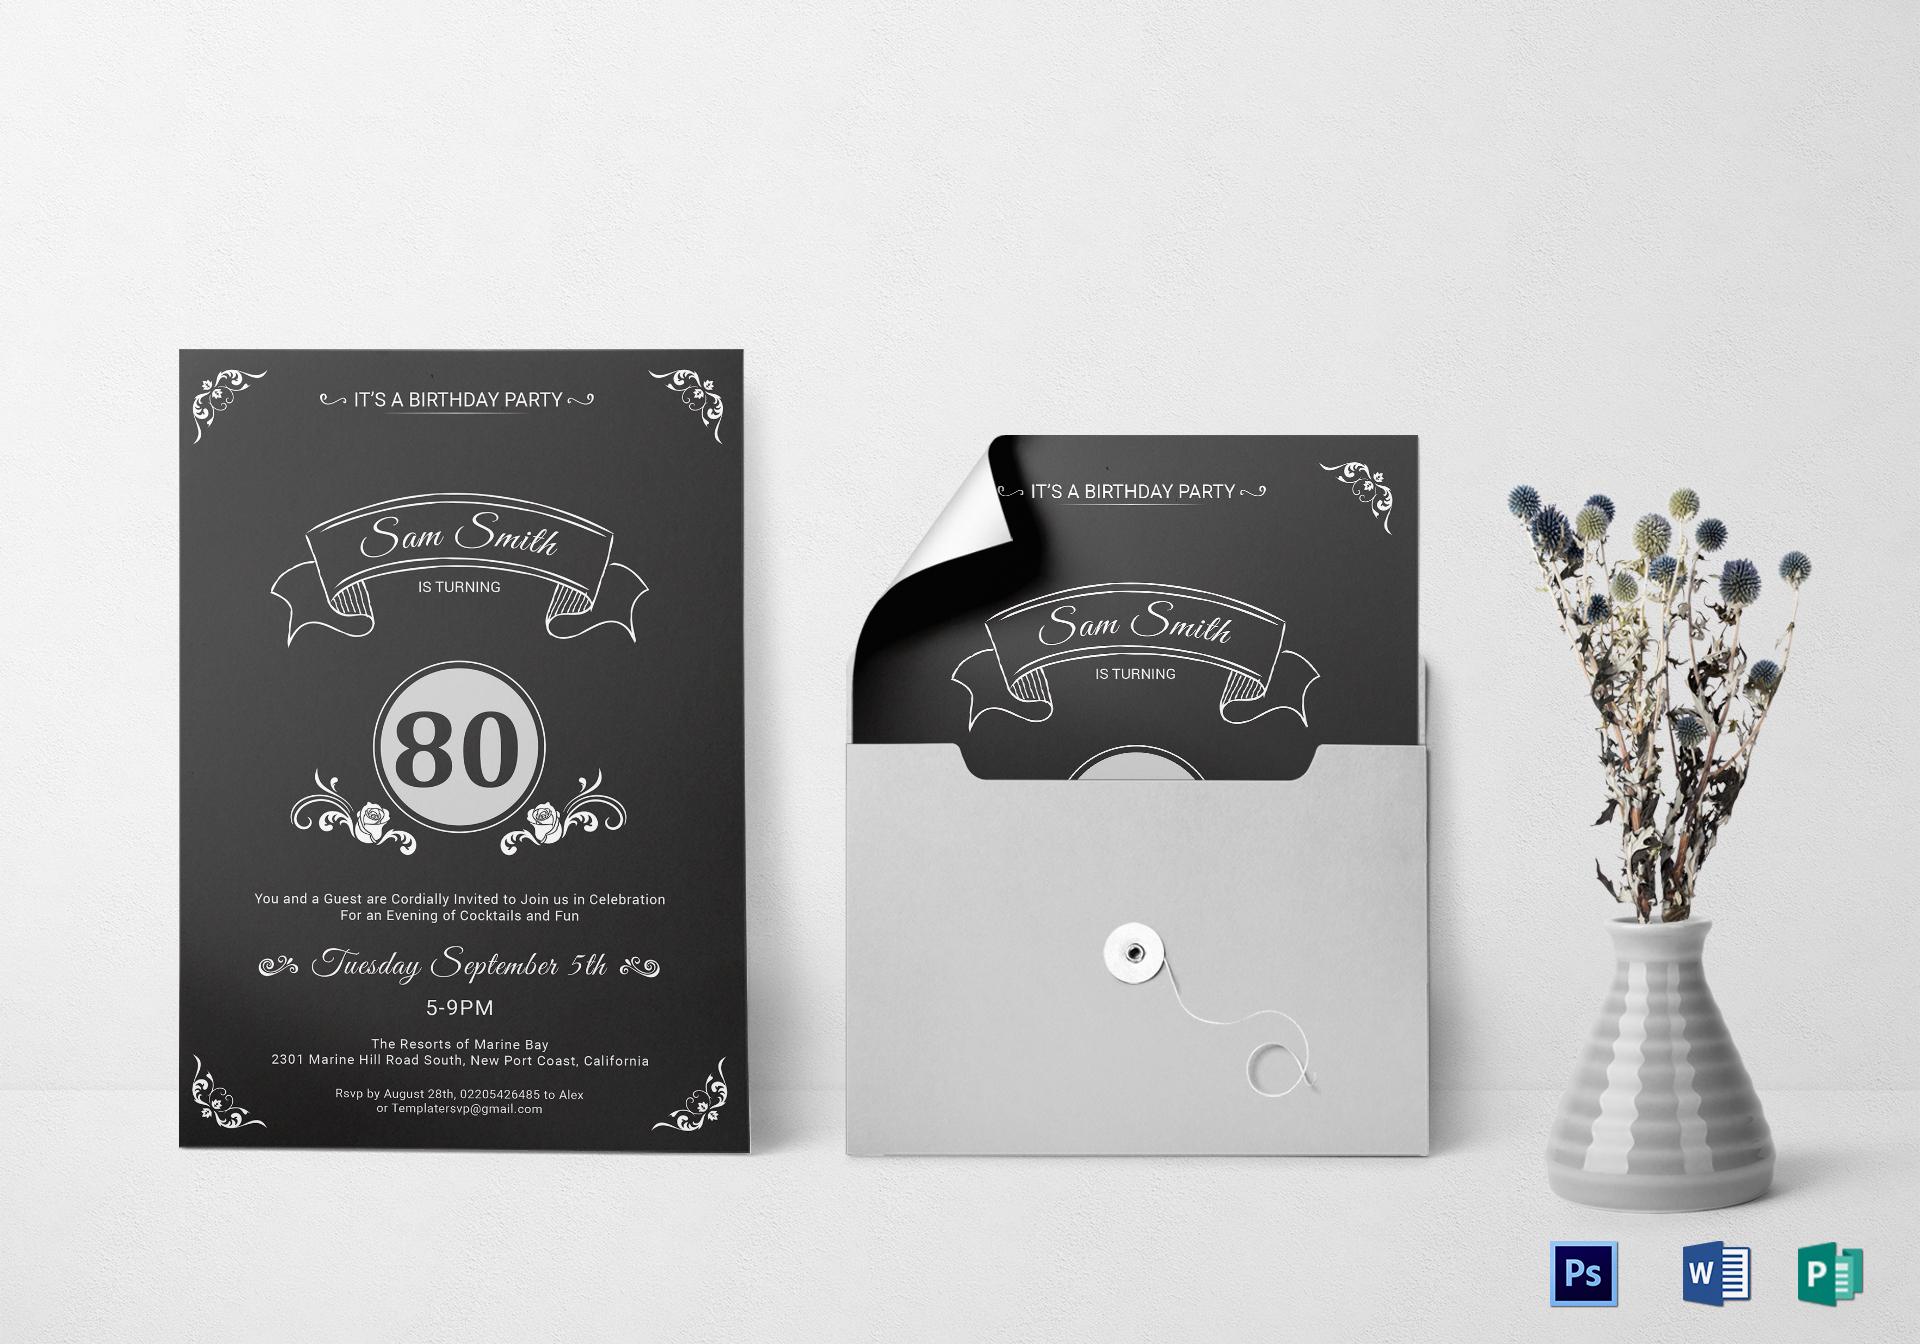 80th birthday party invitation design